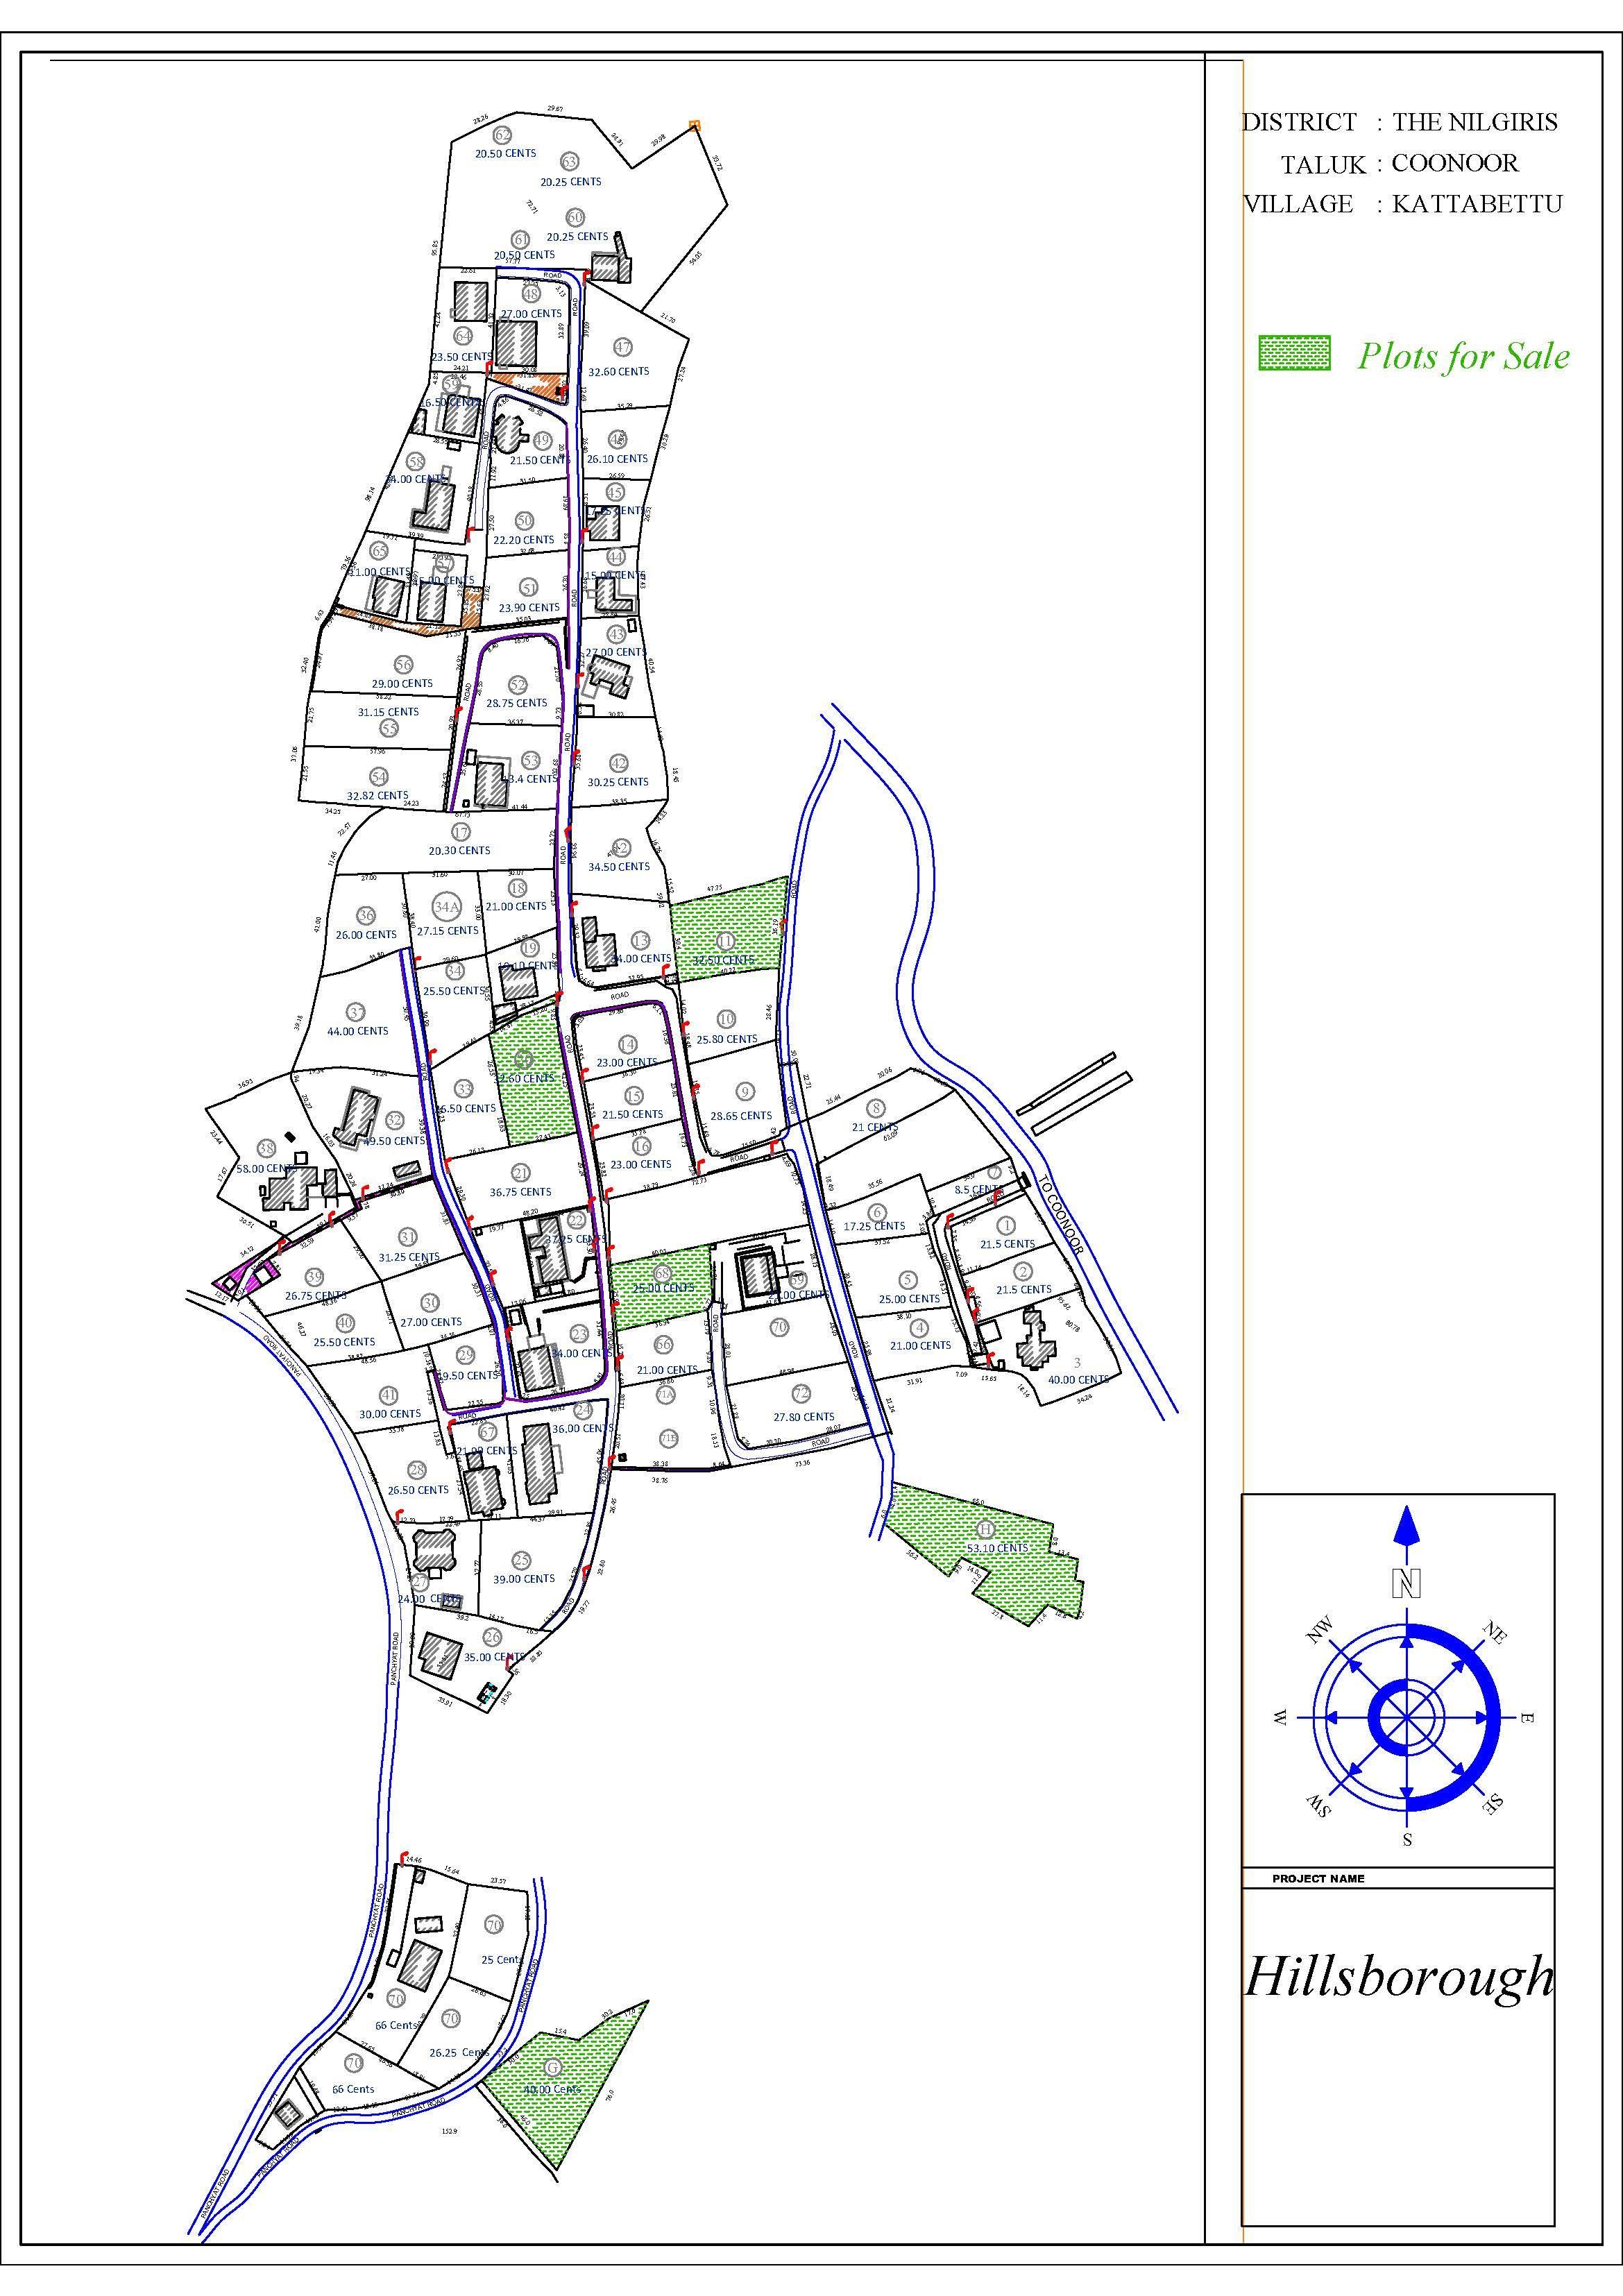 Hillsborough Layout Plan